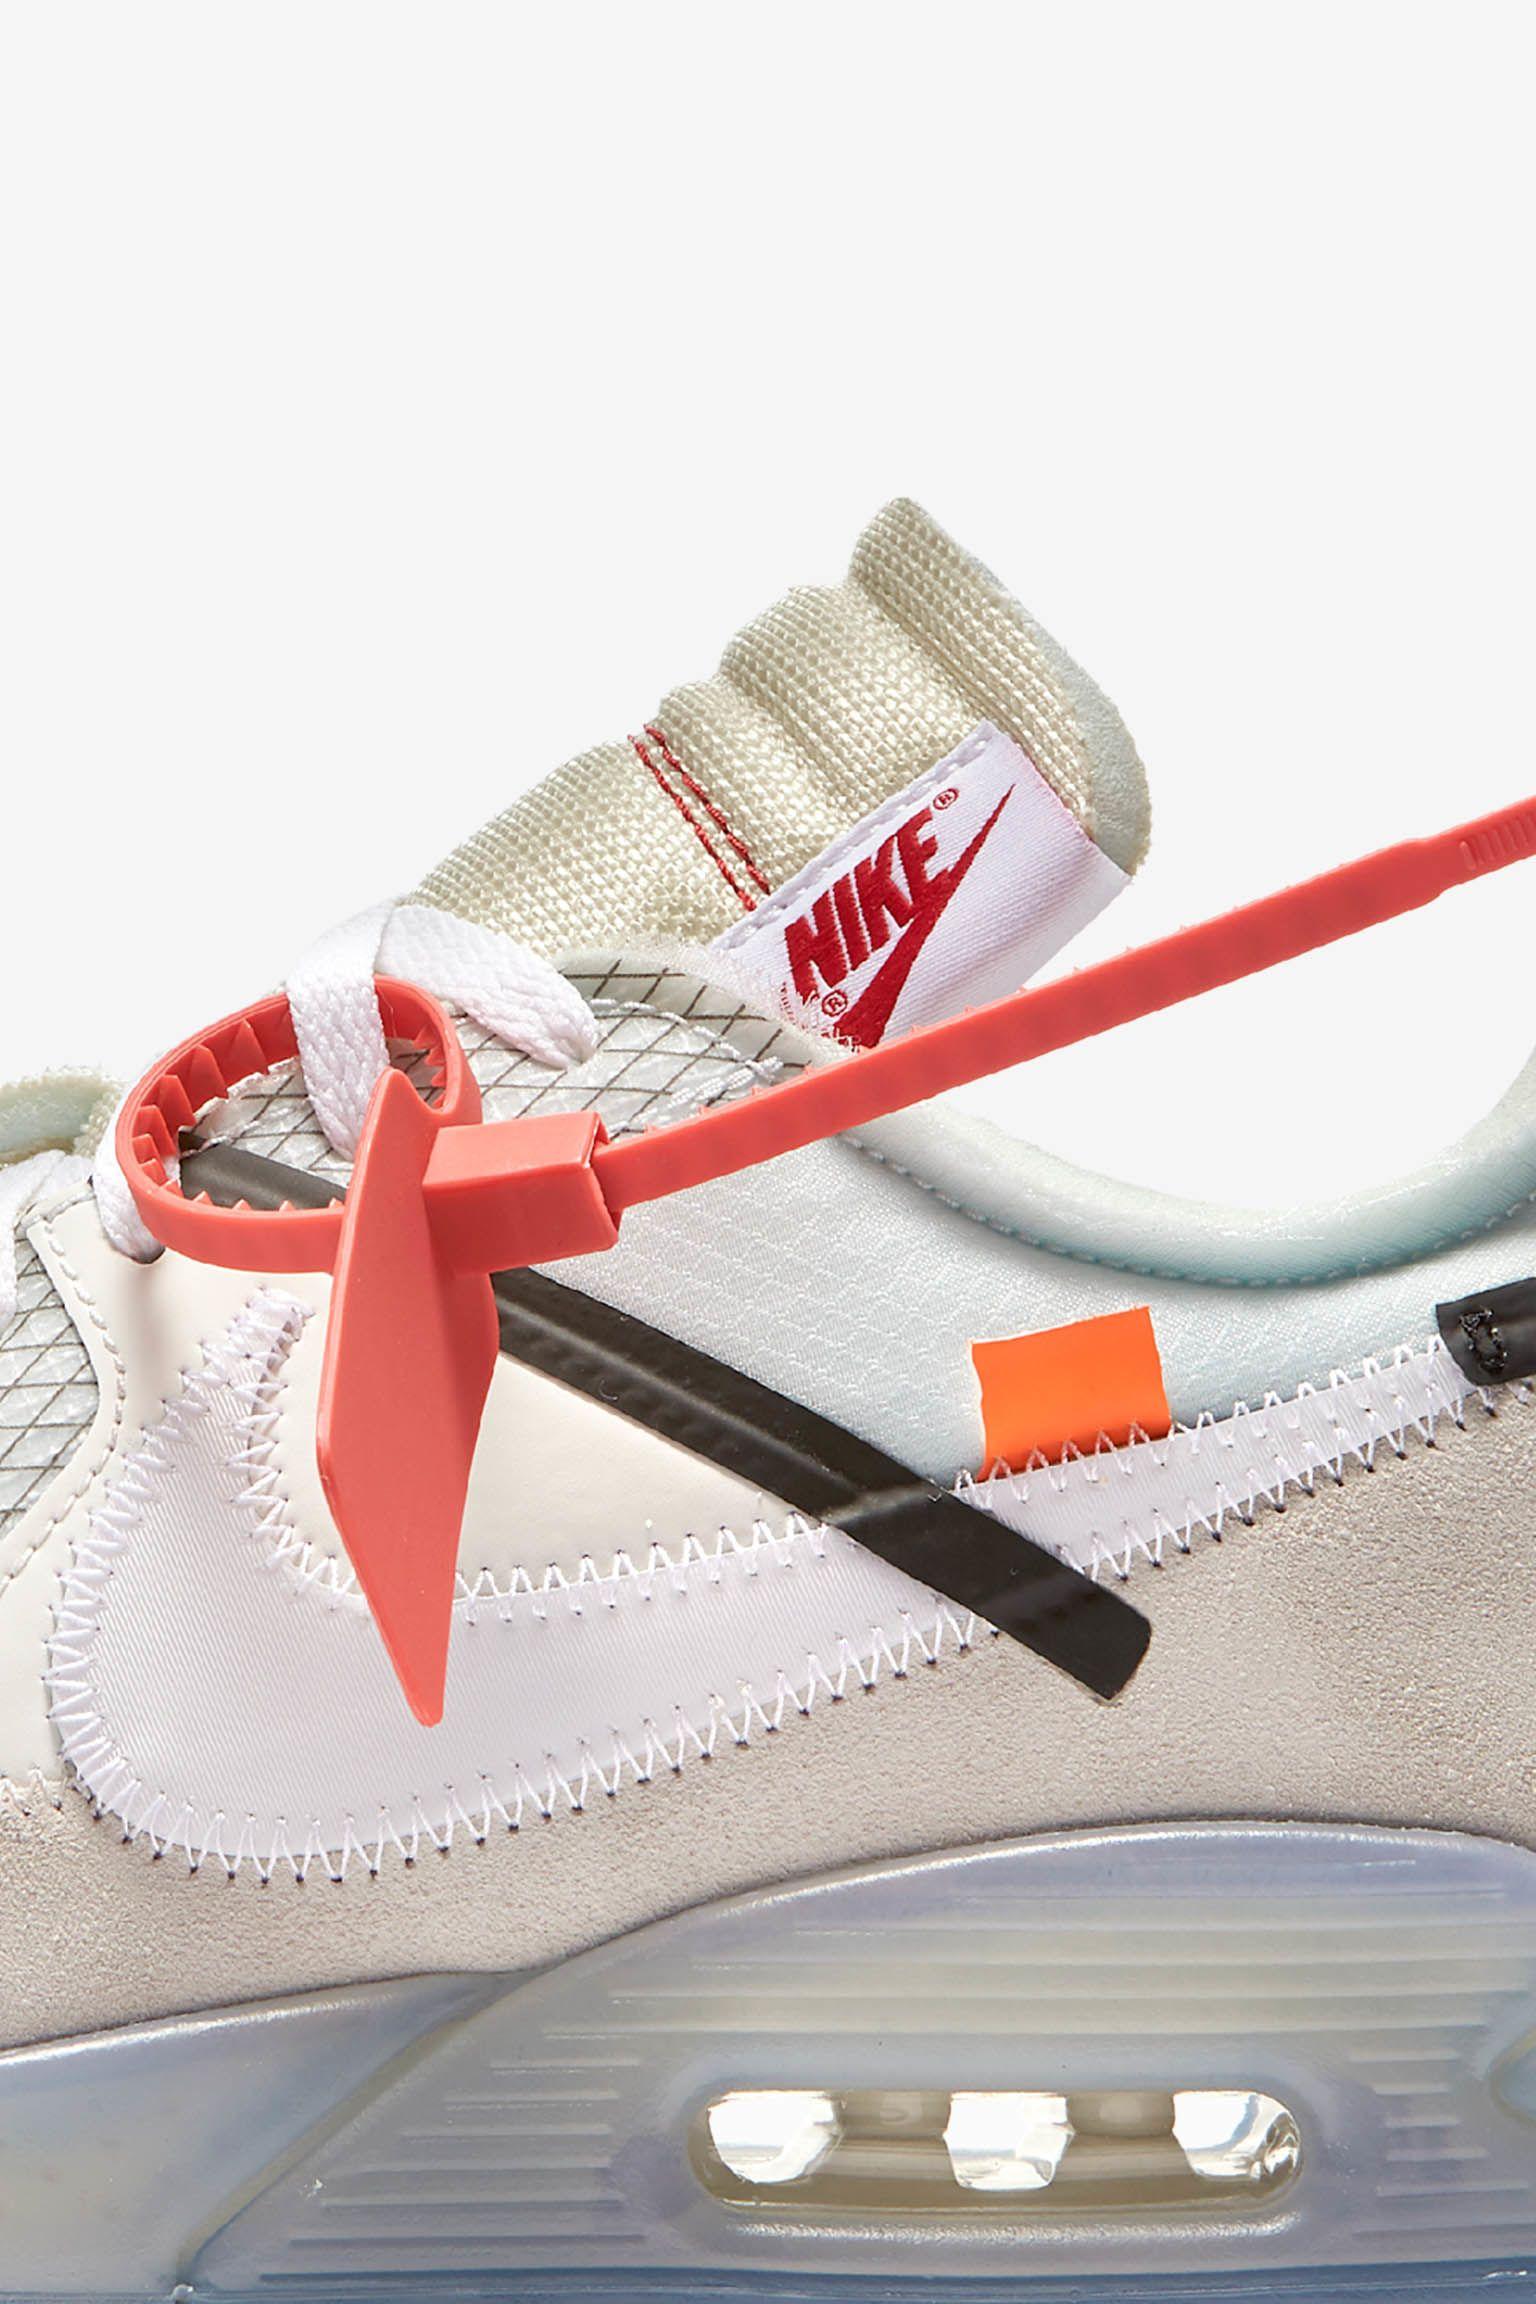 Nike Max 90 Air Date Ten The White « Sortie La » De Nike Off xSx1qOBaw